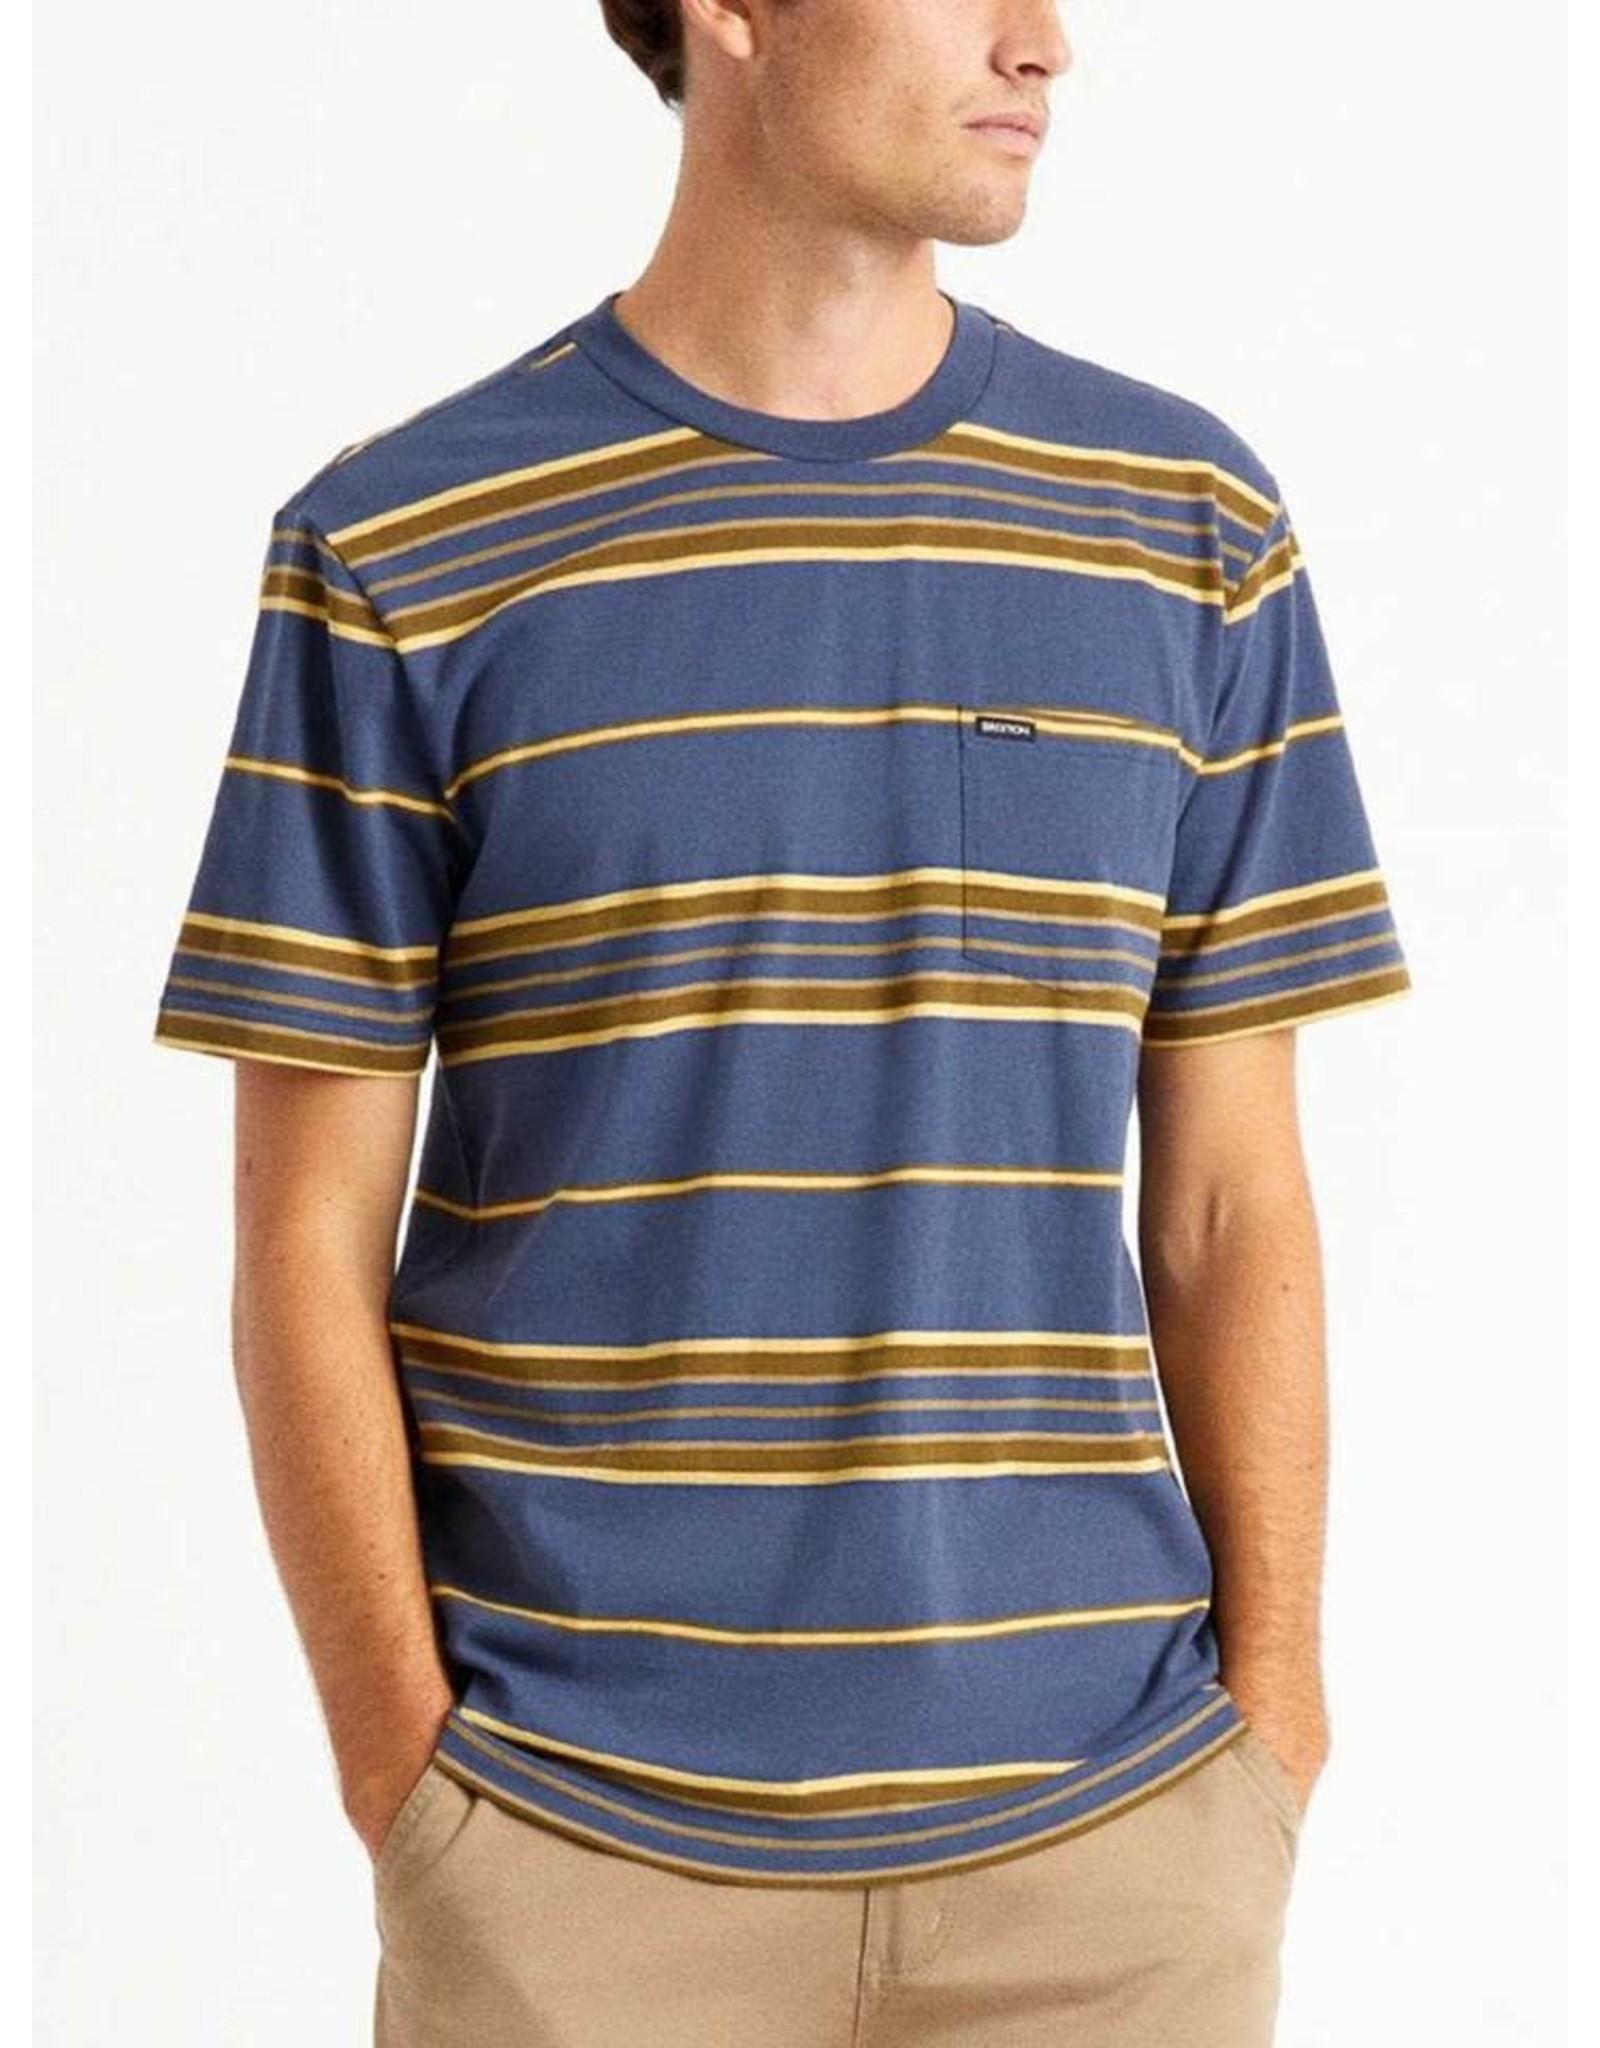 Brixton Brixton - T-shirt homme hilt pocket knit washed navy/blonde